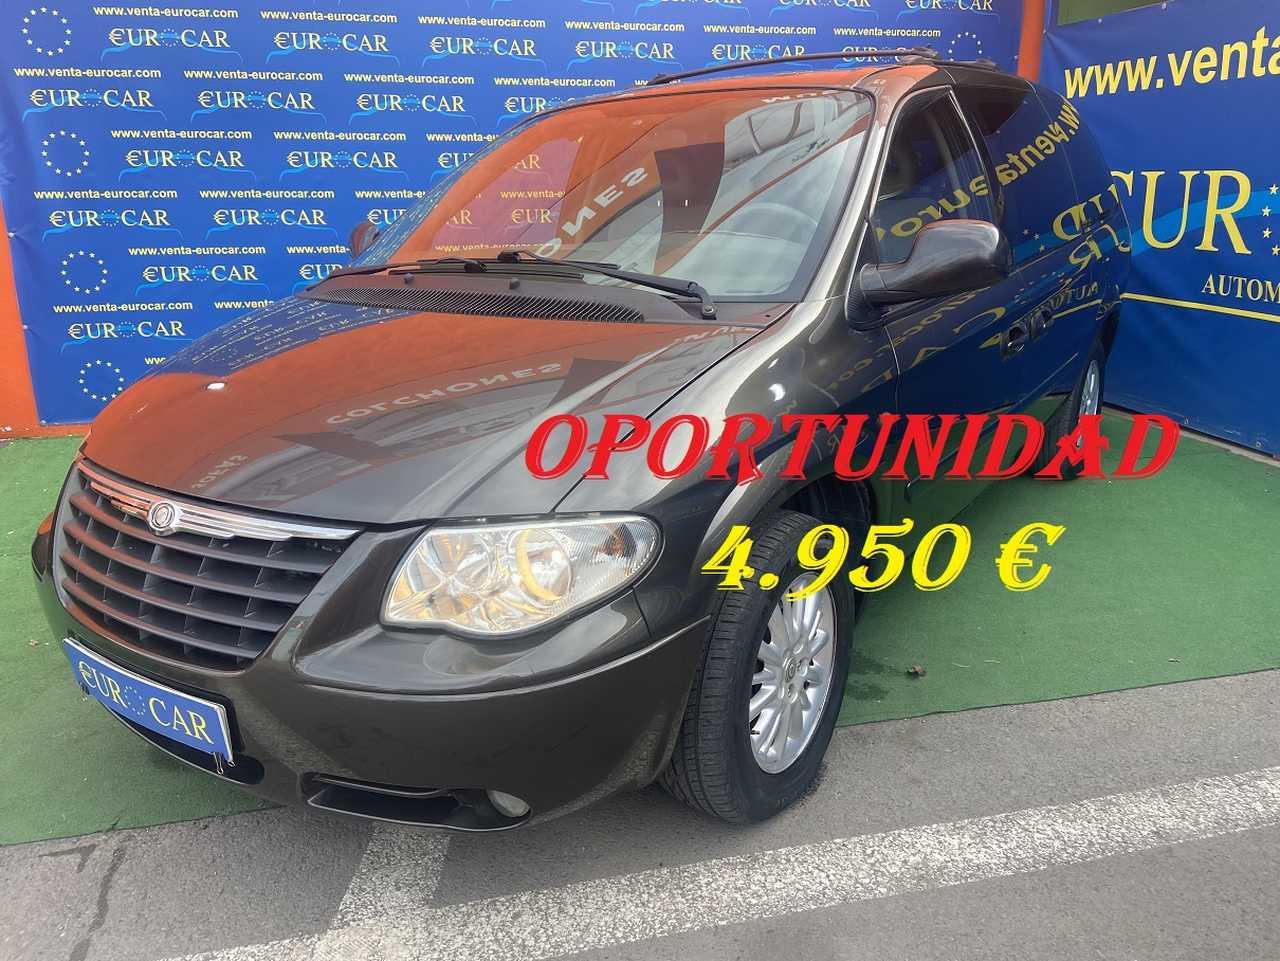 Chrysler Grand voyager 2.8 CRDI AUT   - Foto 1